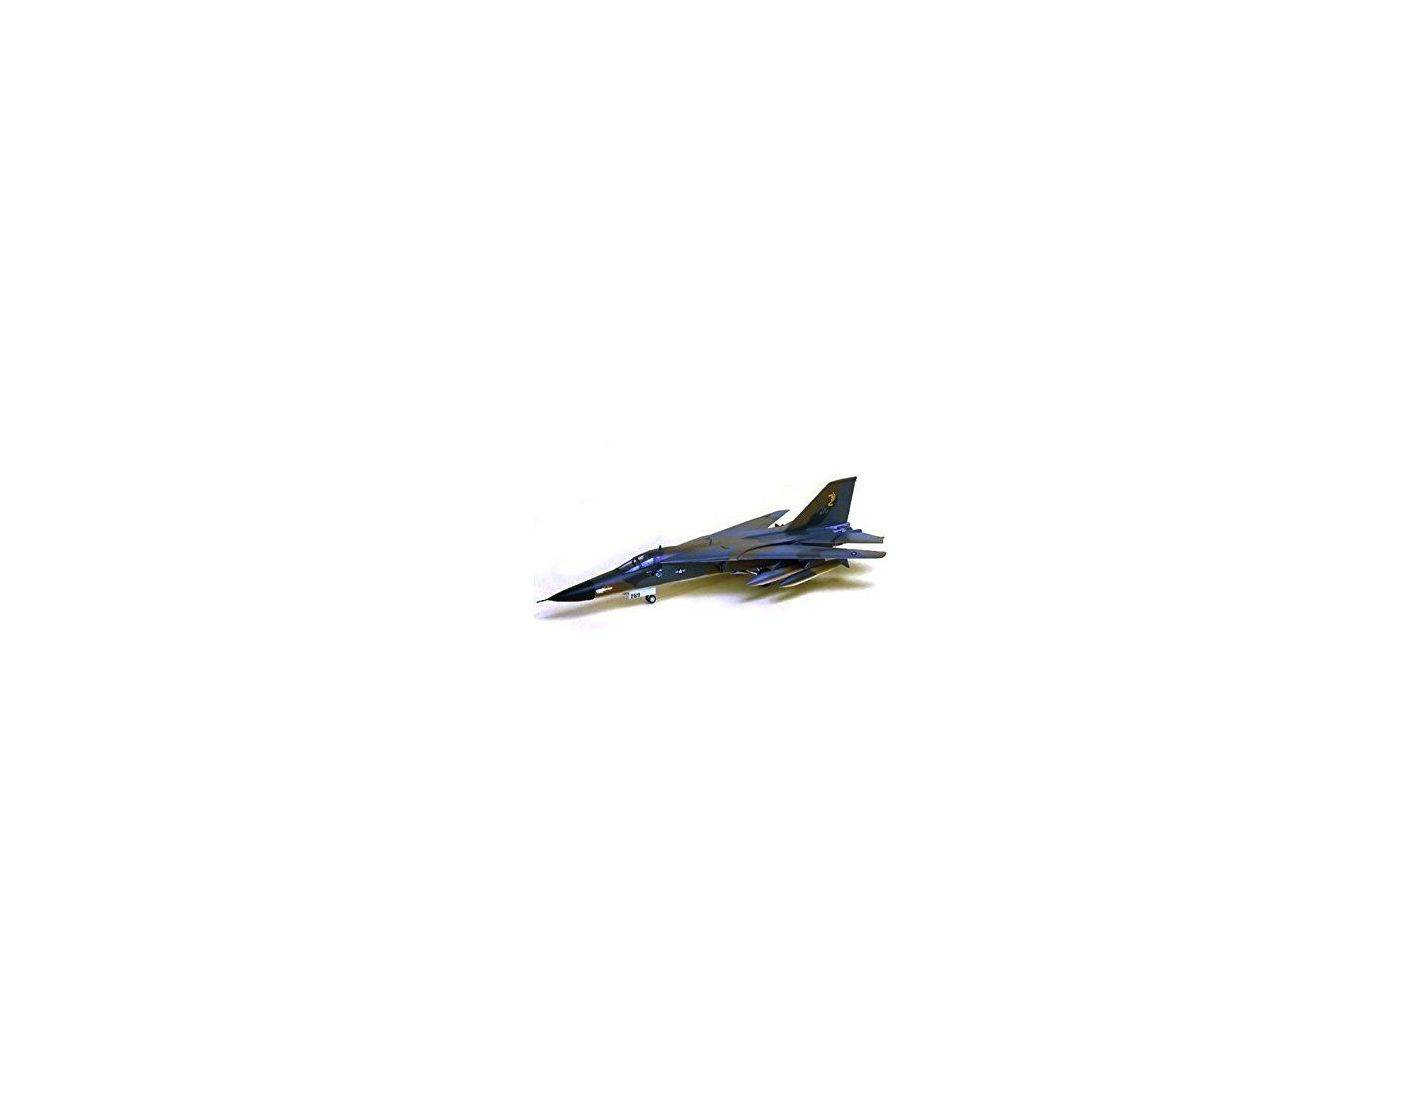 ACADEMY 1648 FB-111A AARDVARK ACADEMY 1:48 Kit Modellino